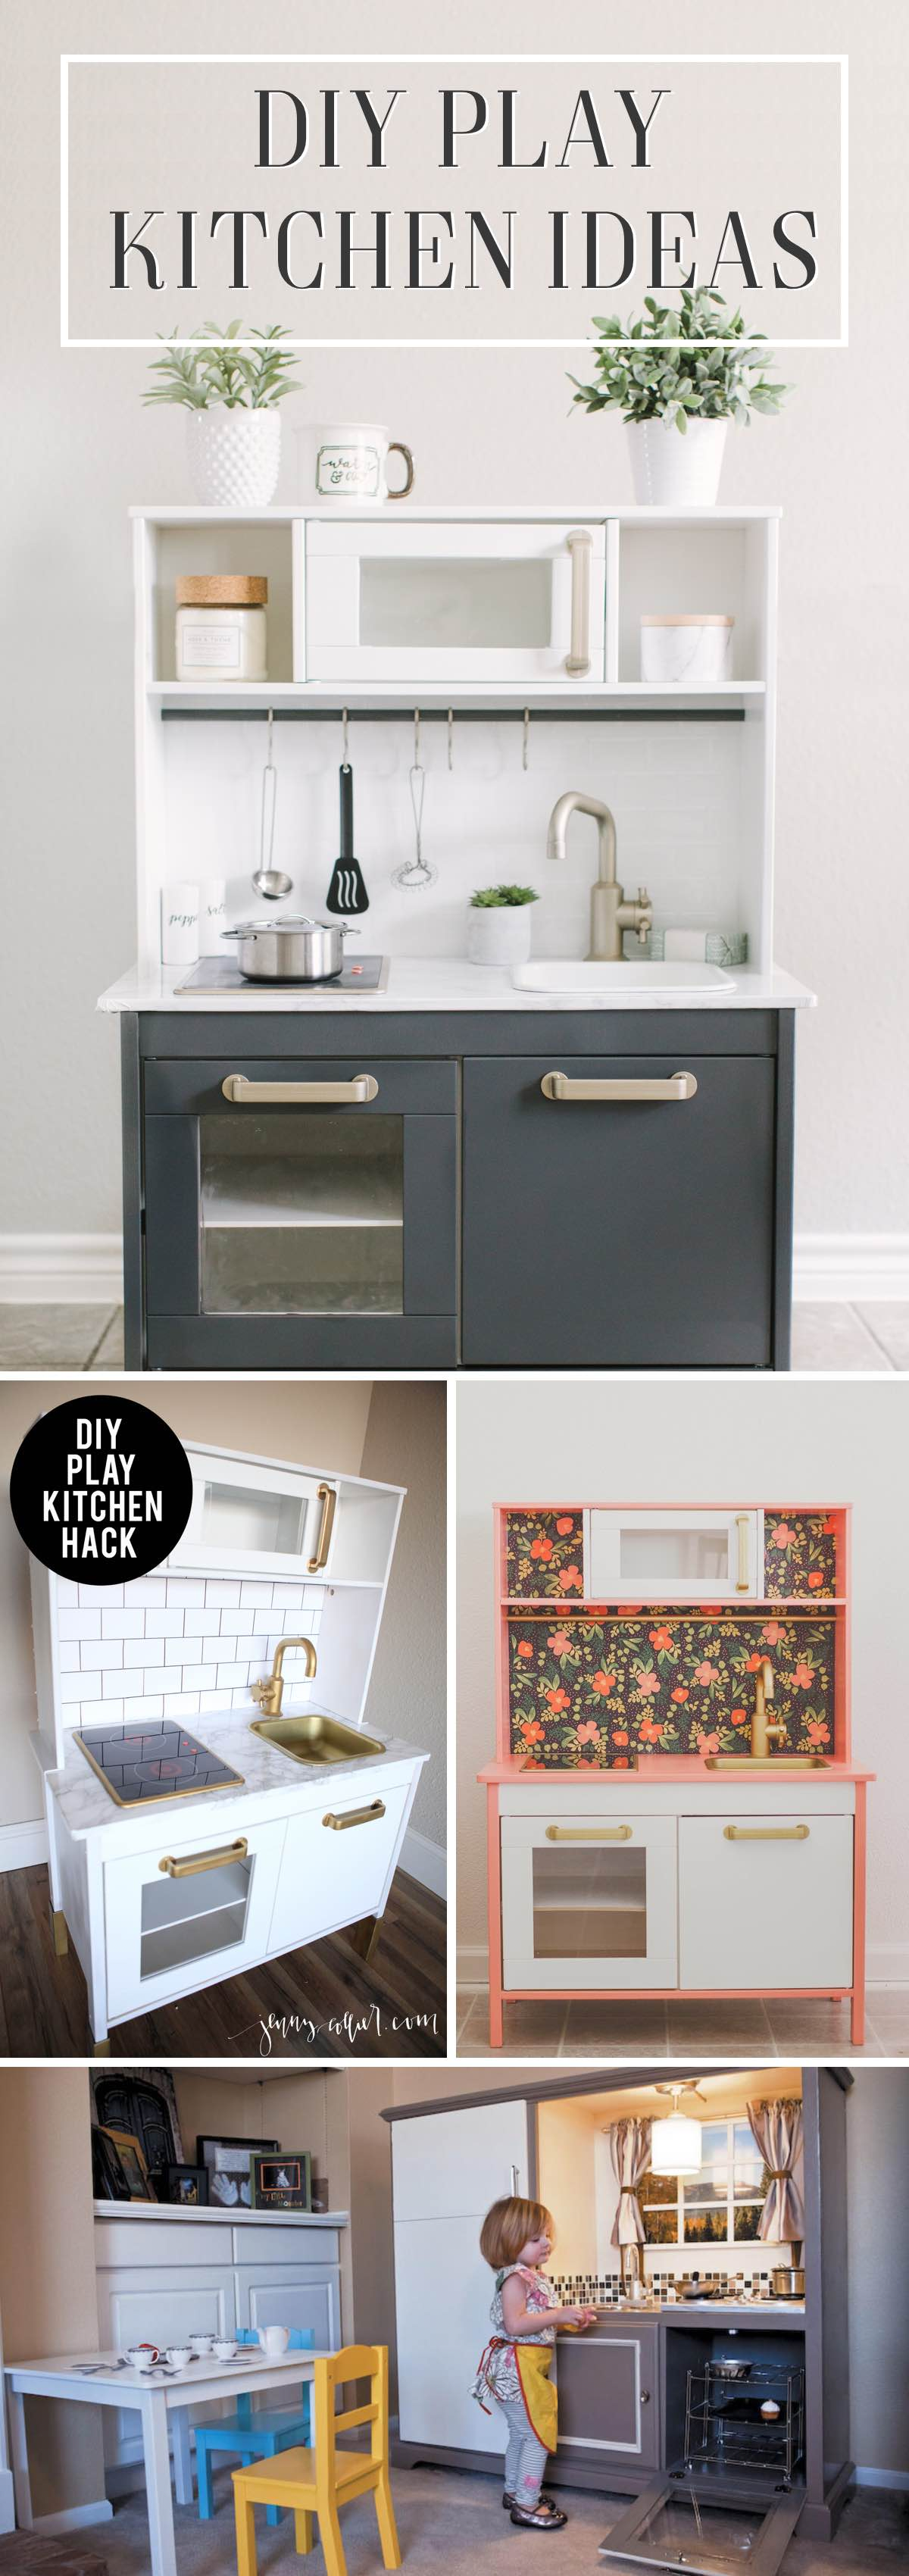 24 DIY Play Kitchen Ideas Making Miniature Pretties That Look Realistic!